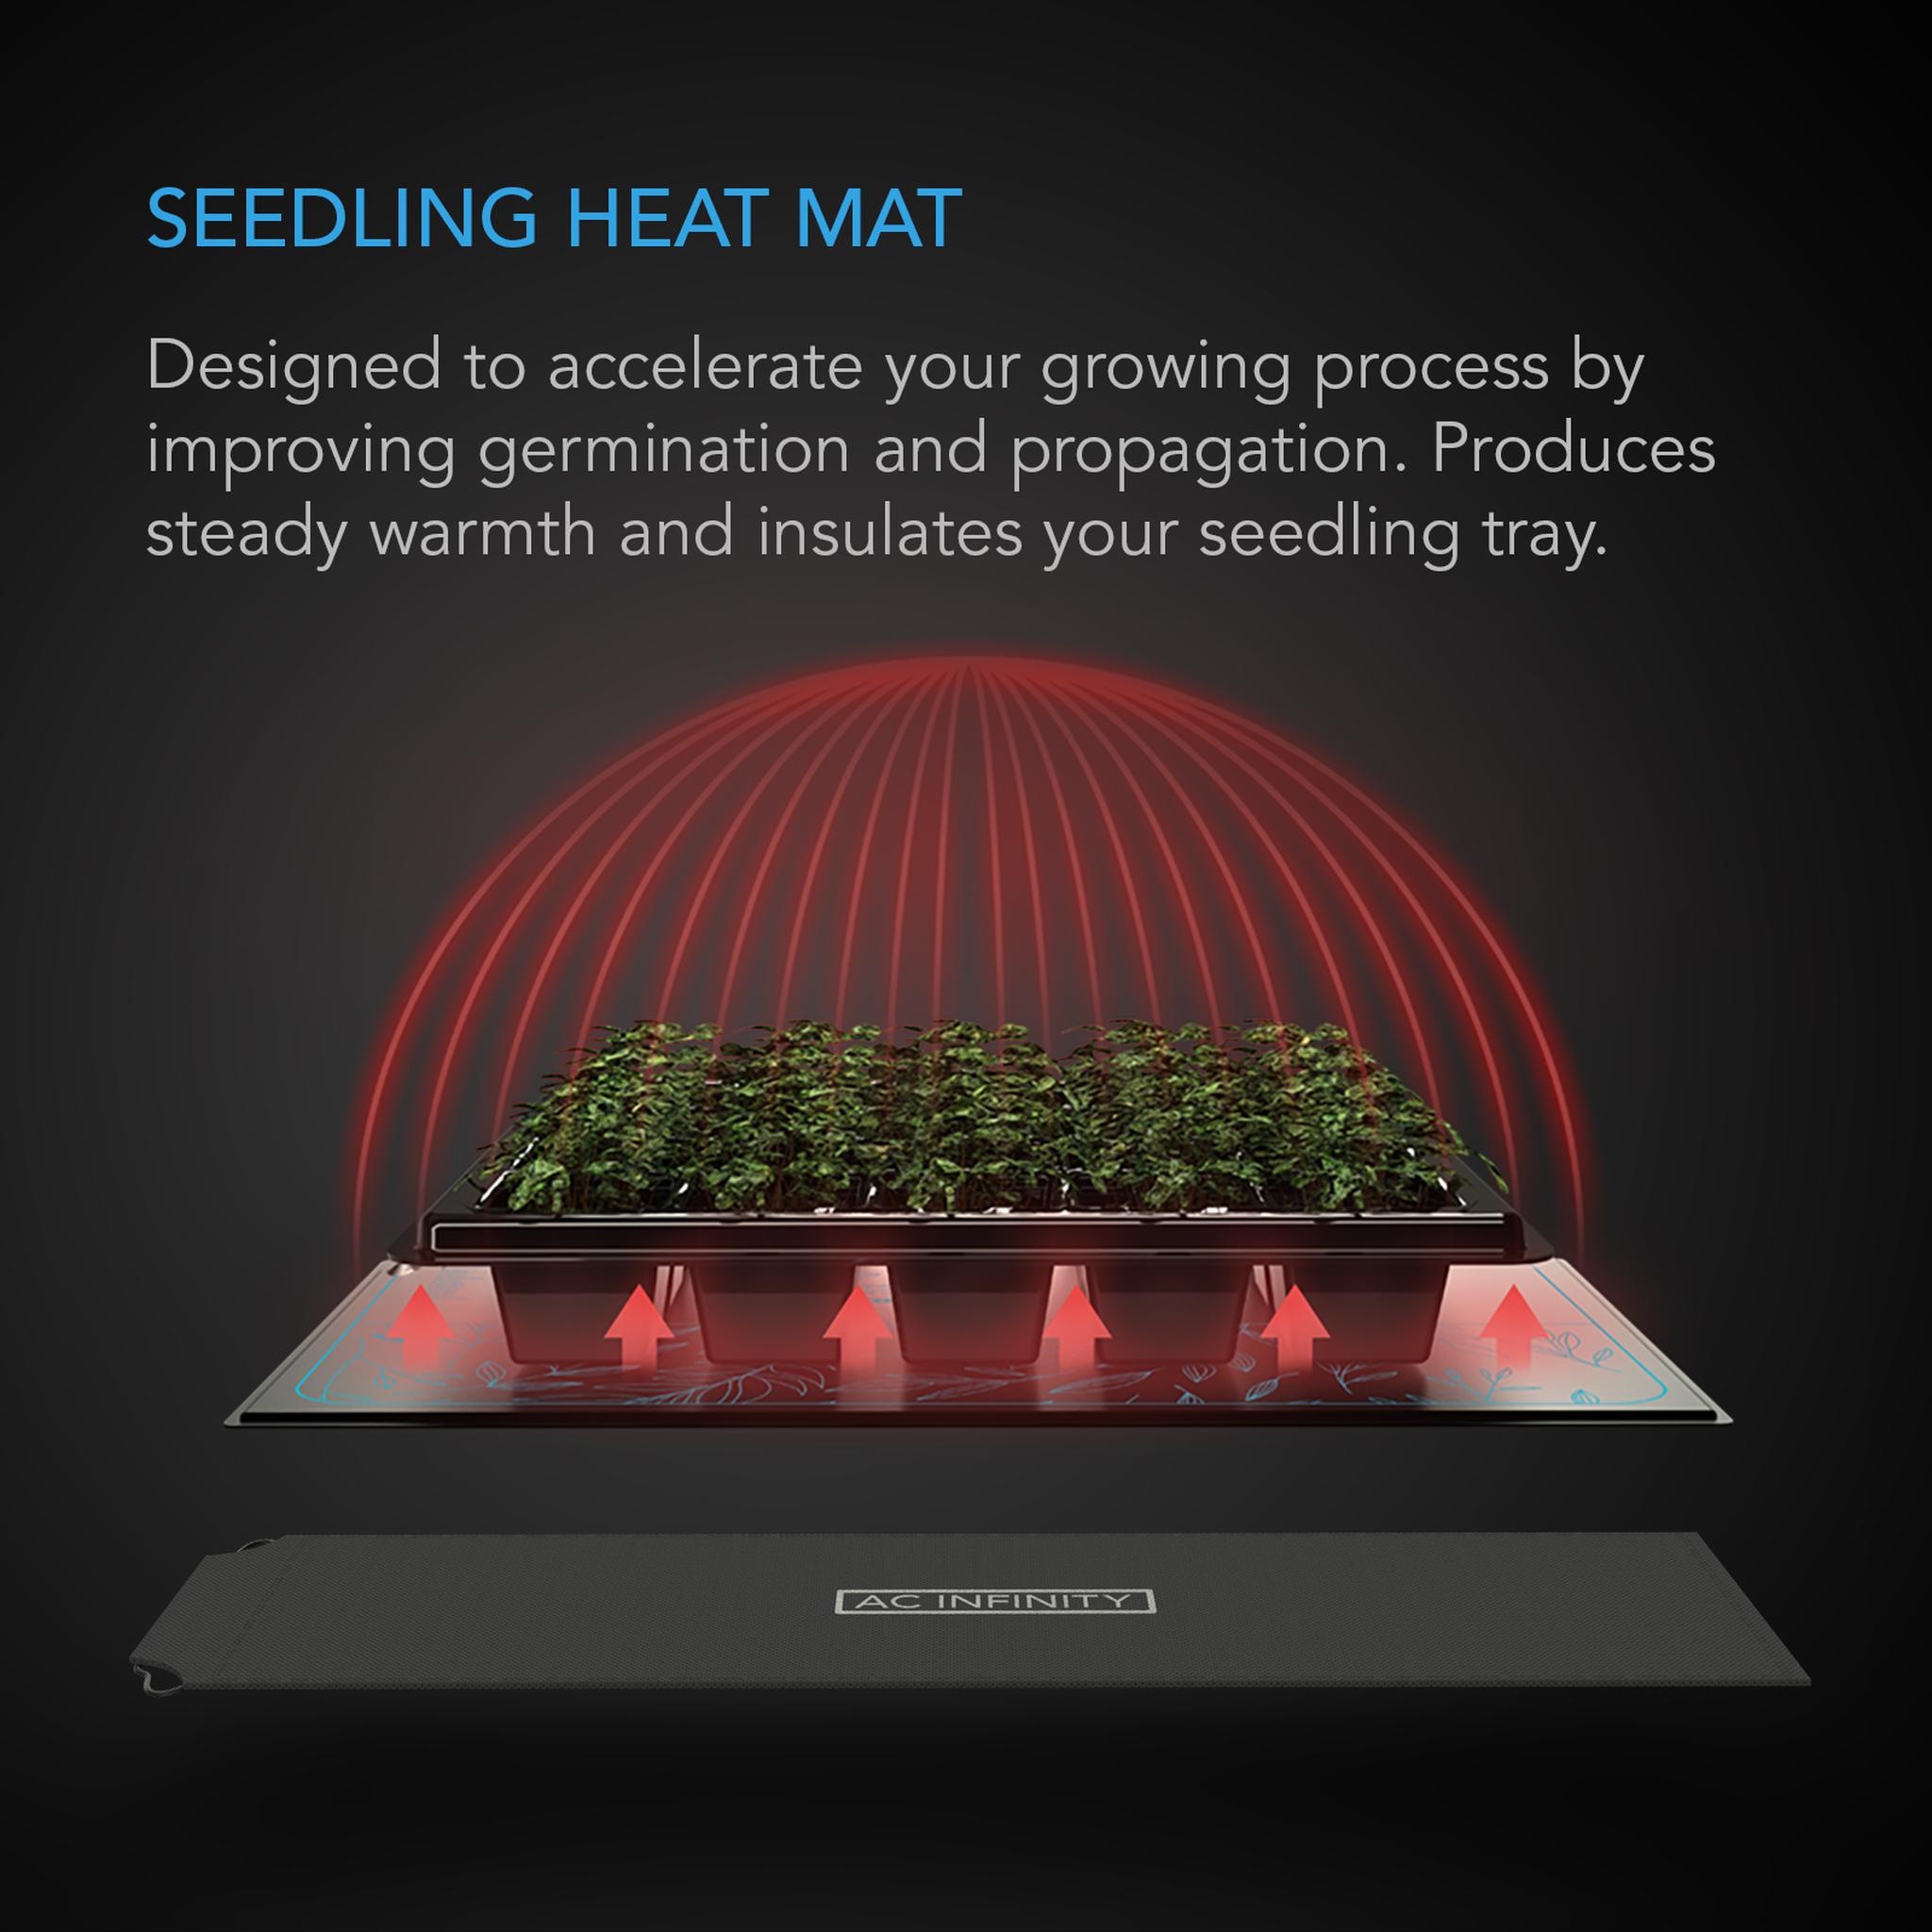 Seedling heat mat information